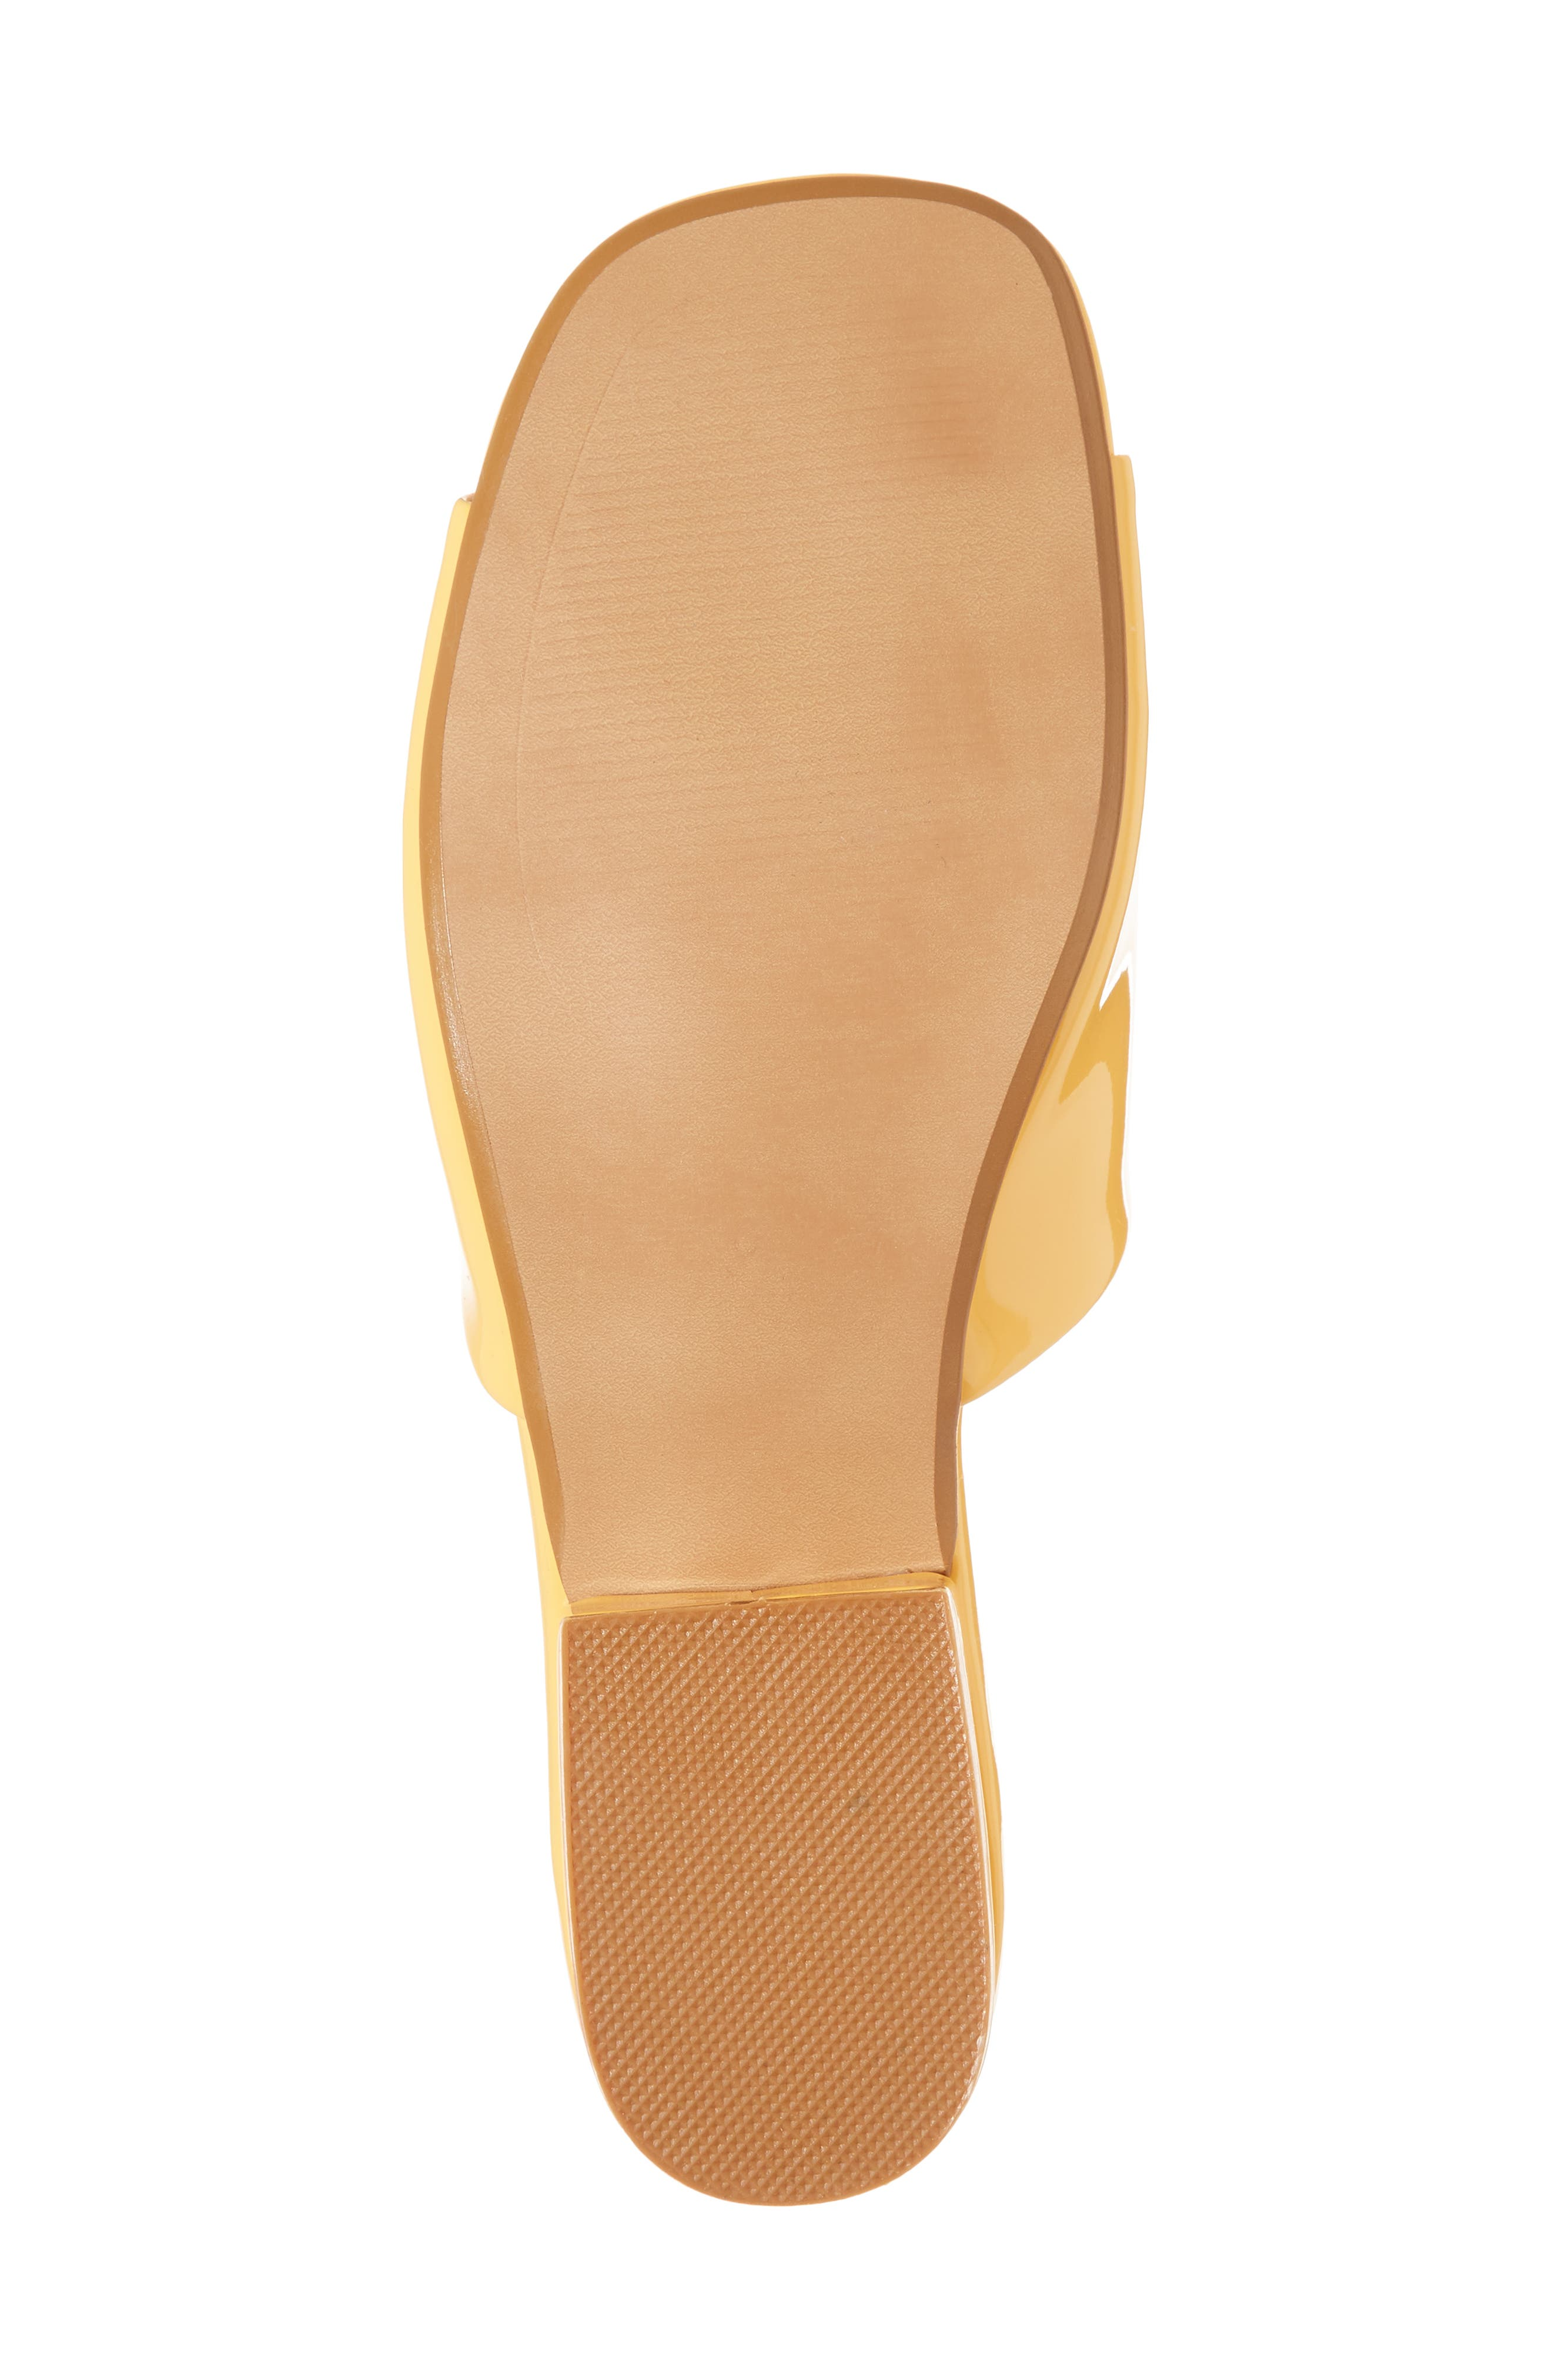 Plantain Slide Sandal,                             Alternate thumbnail 6, color,                             Mango